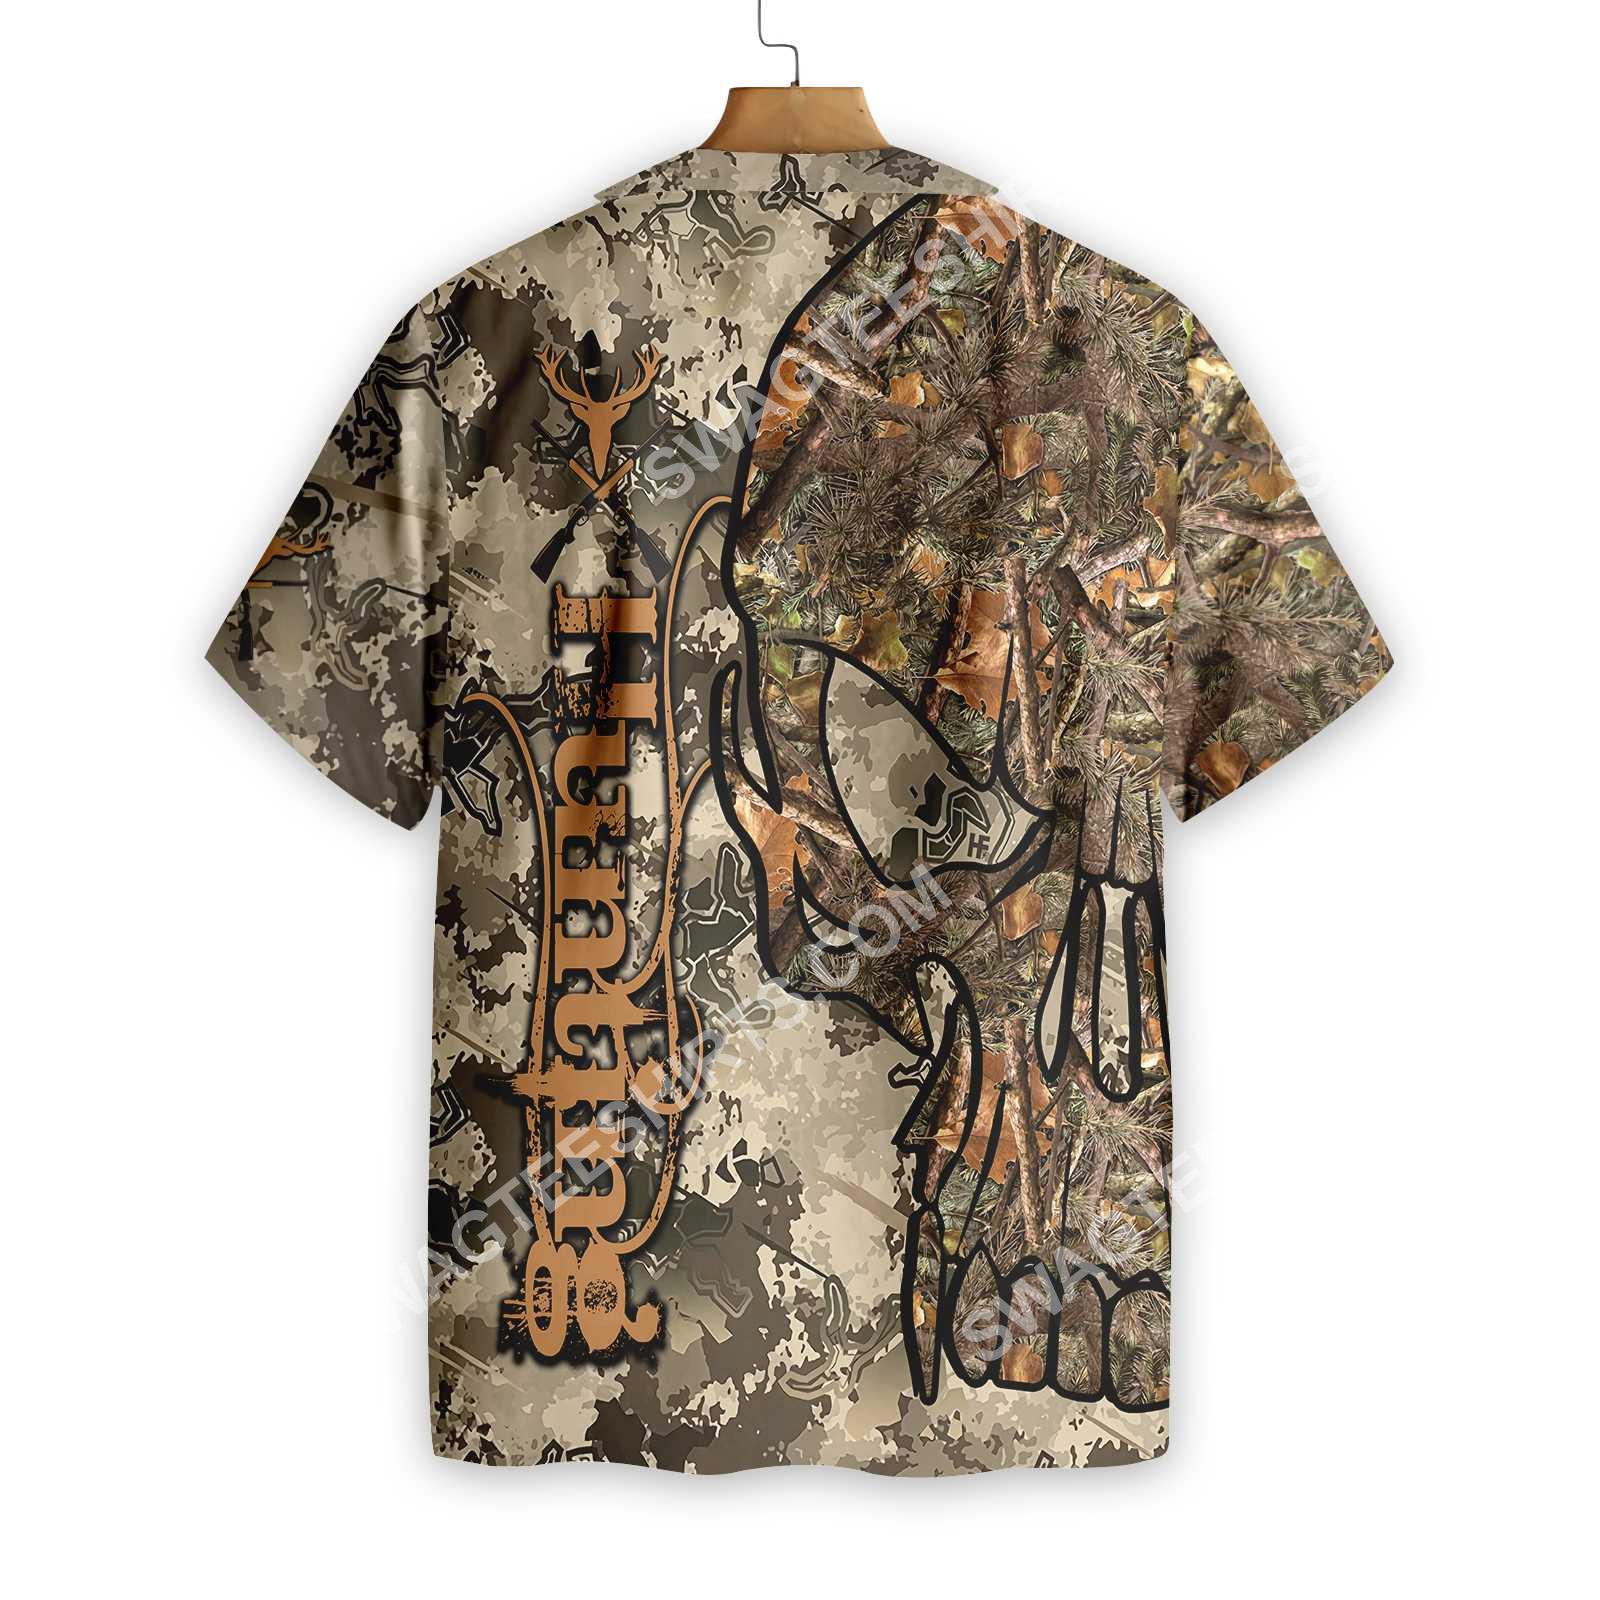 hunting skull camo pattern all over printed hawaiian shirt 4(1)